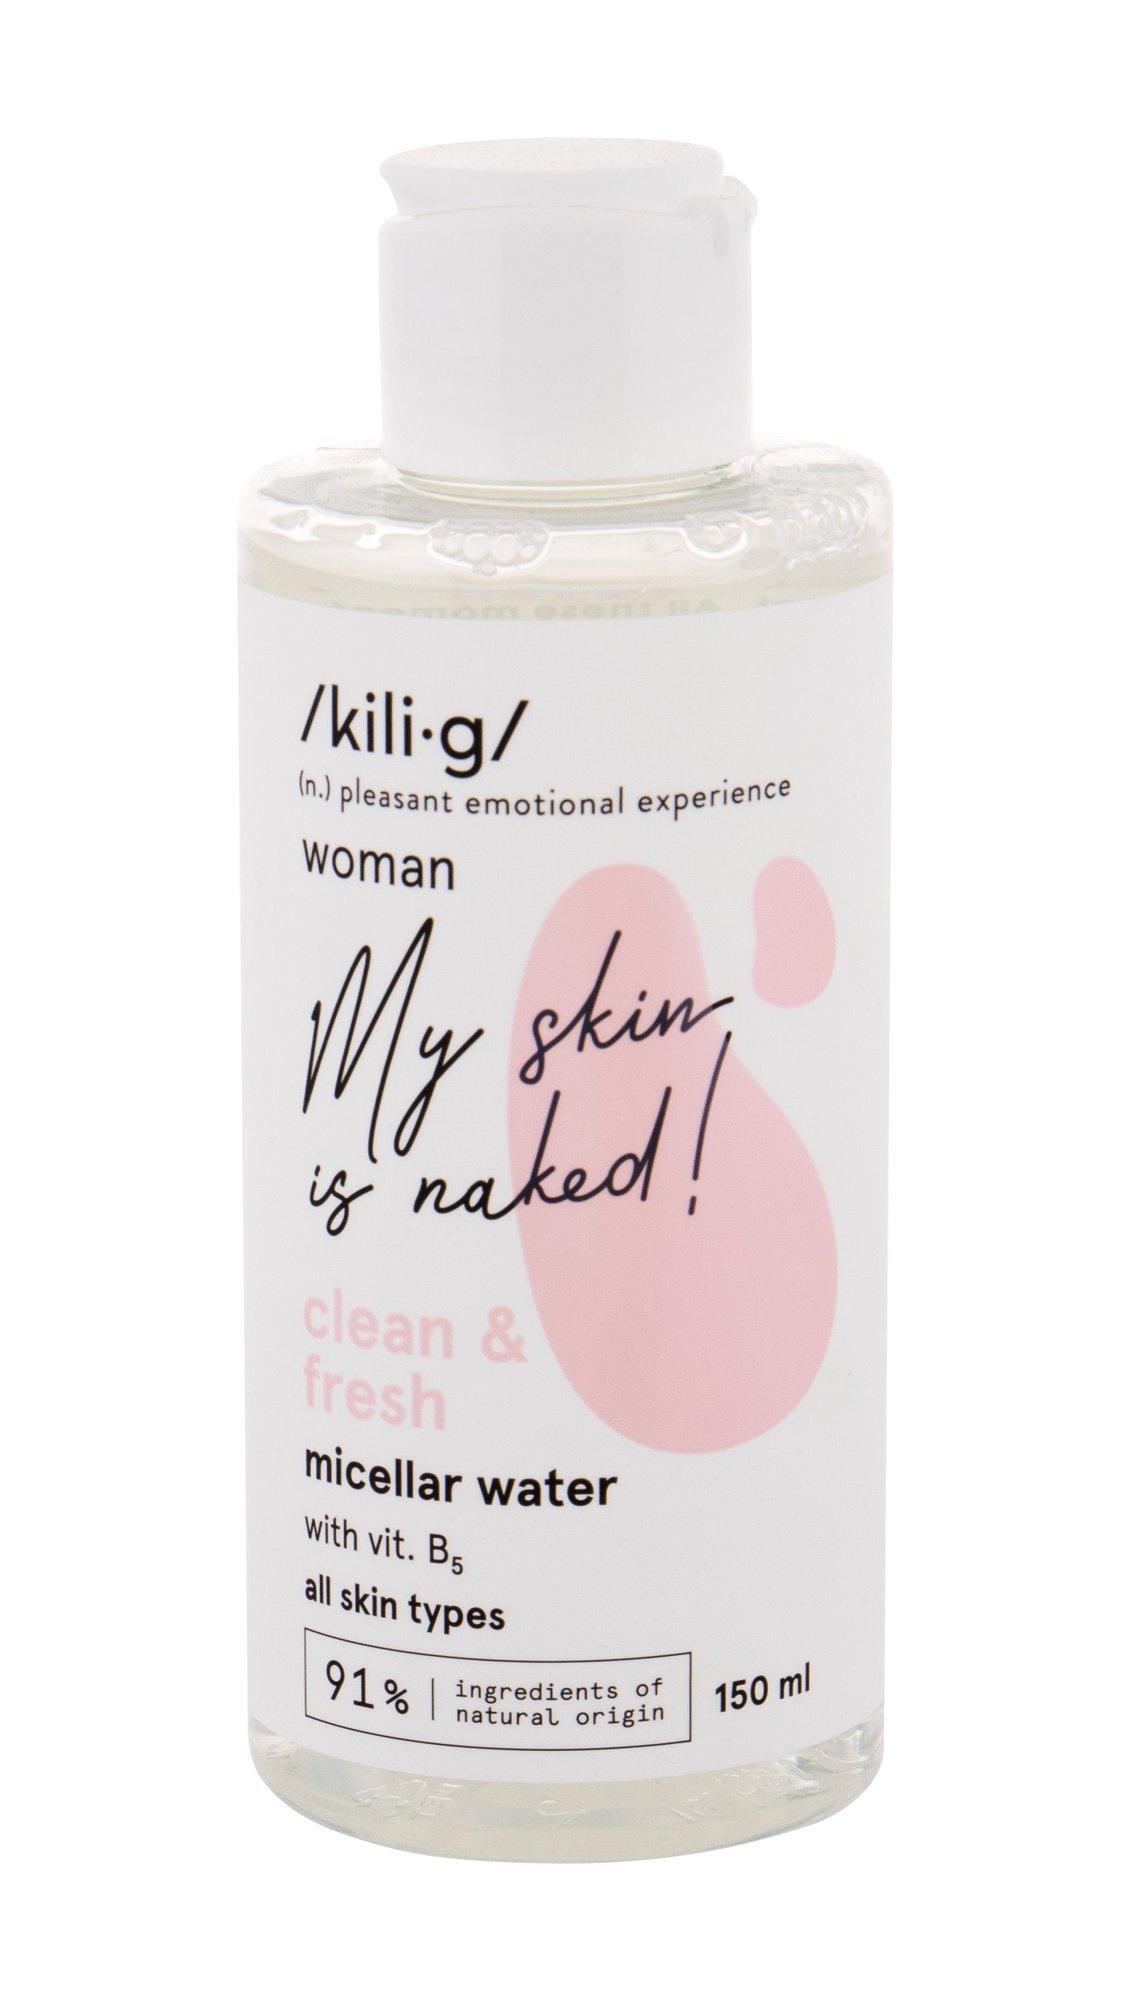 kili·g woman clean & fresh Micellar Water 150ml